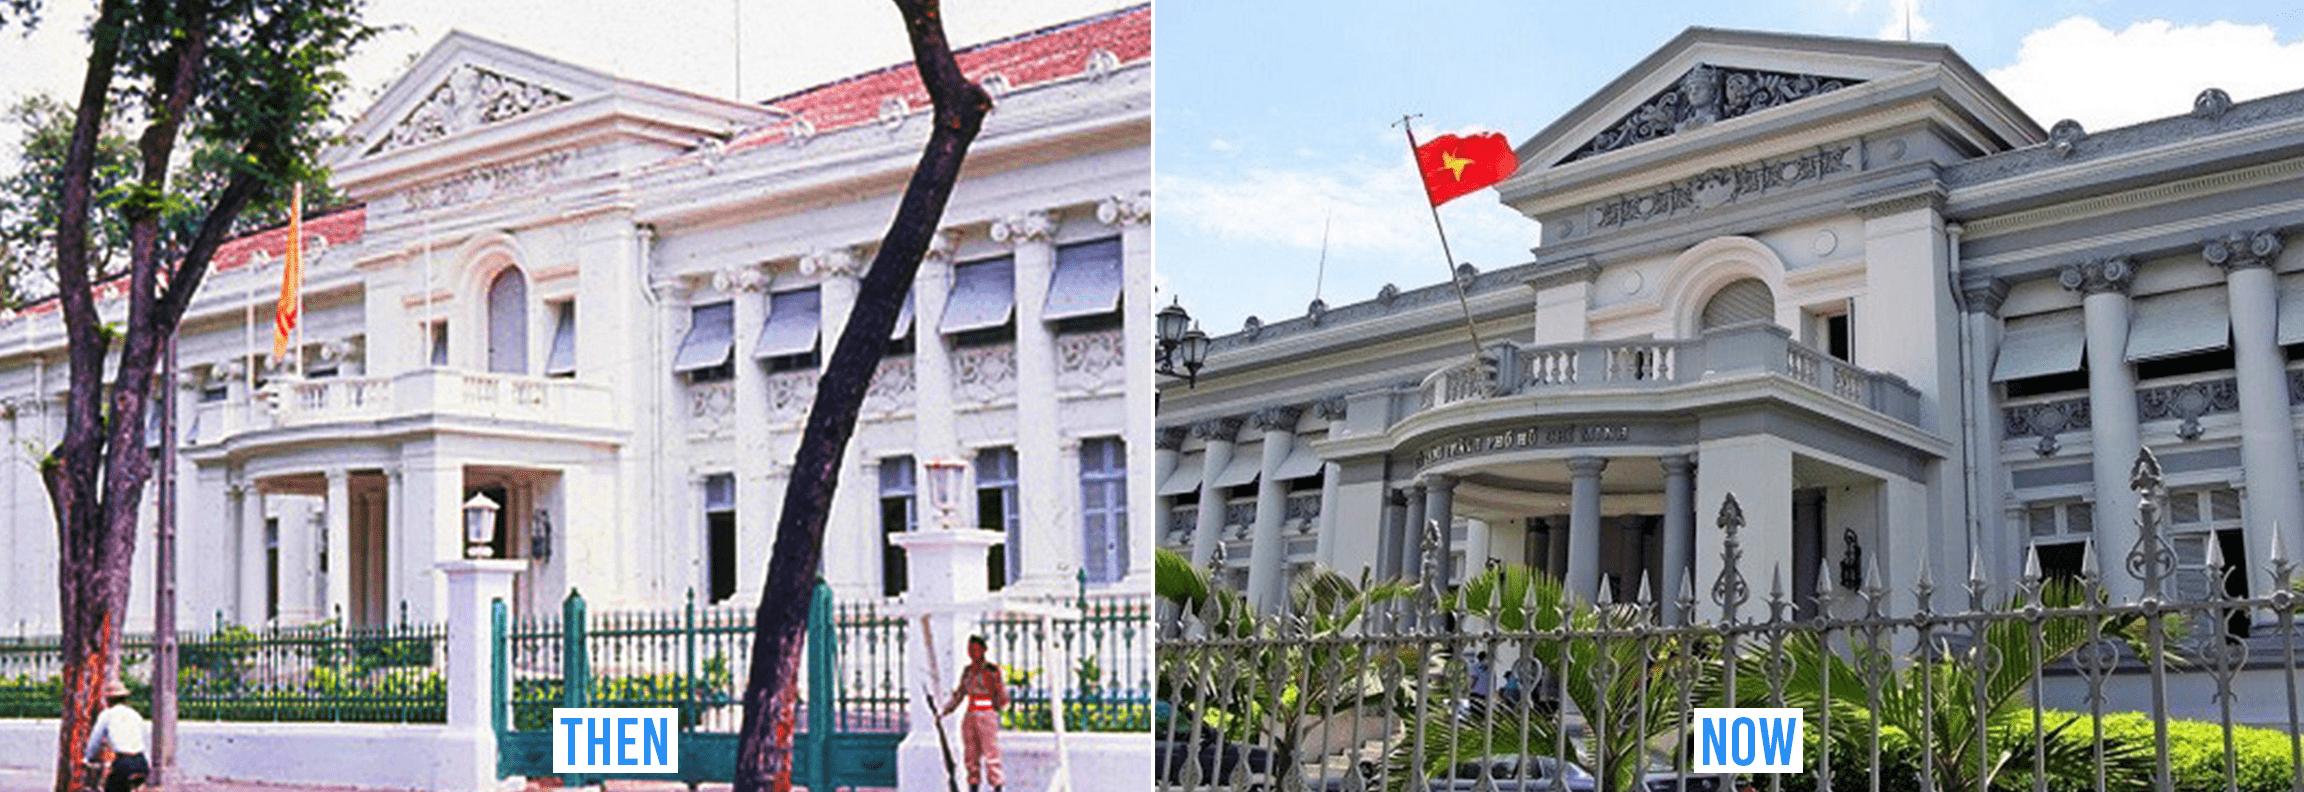 Saigon then & now _ Gia Long palace